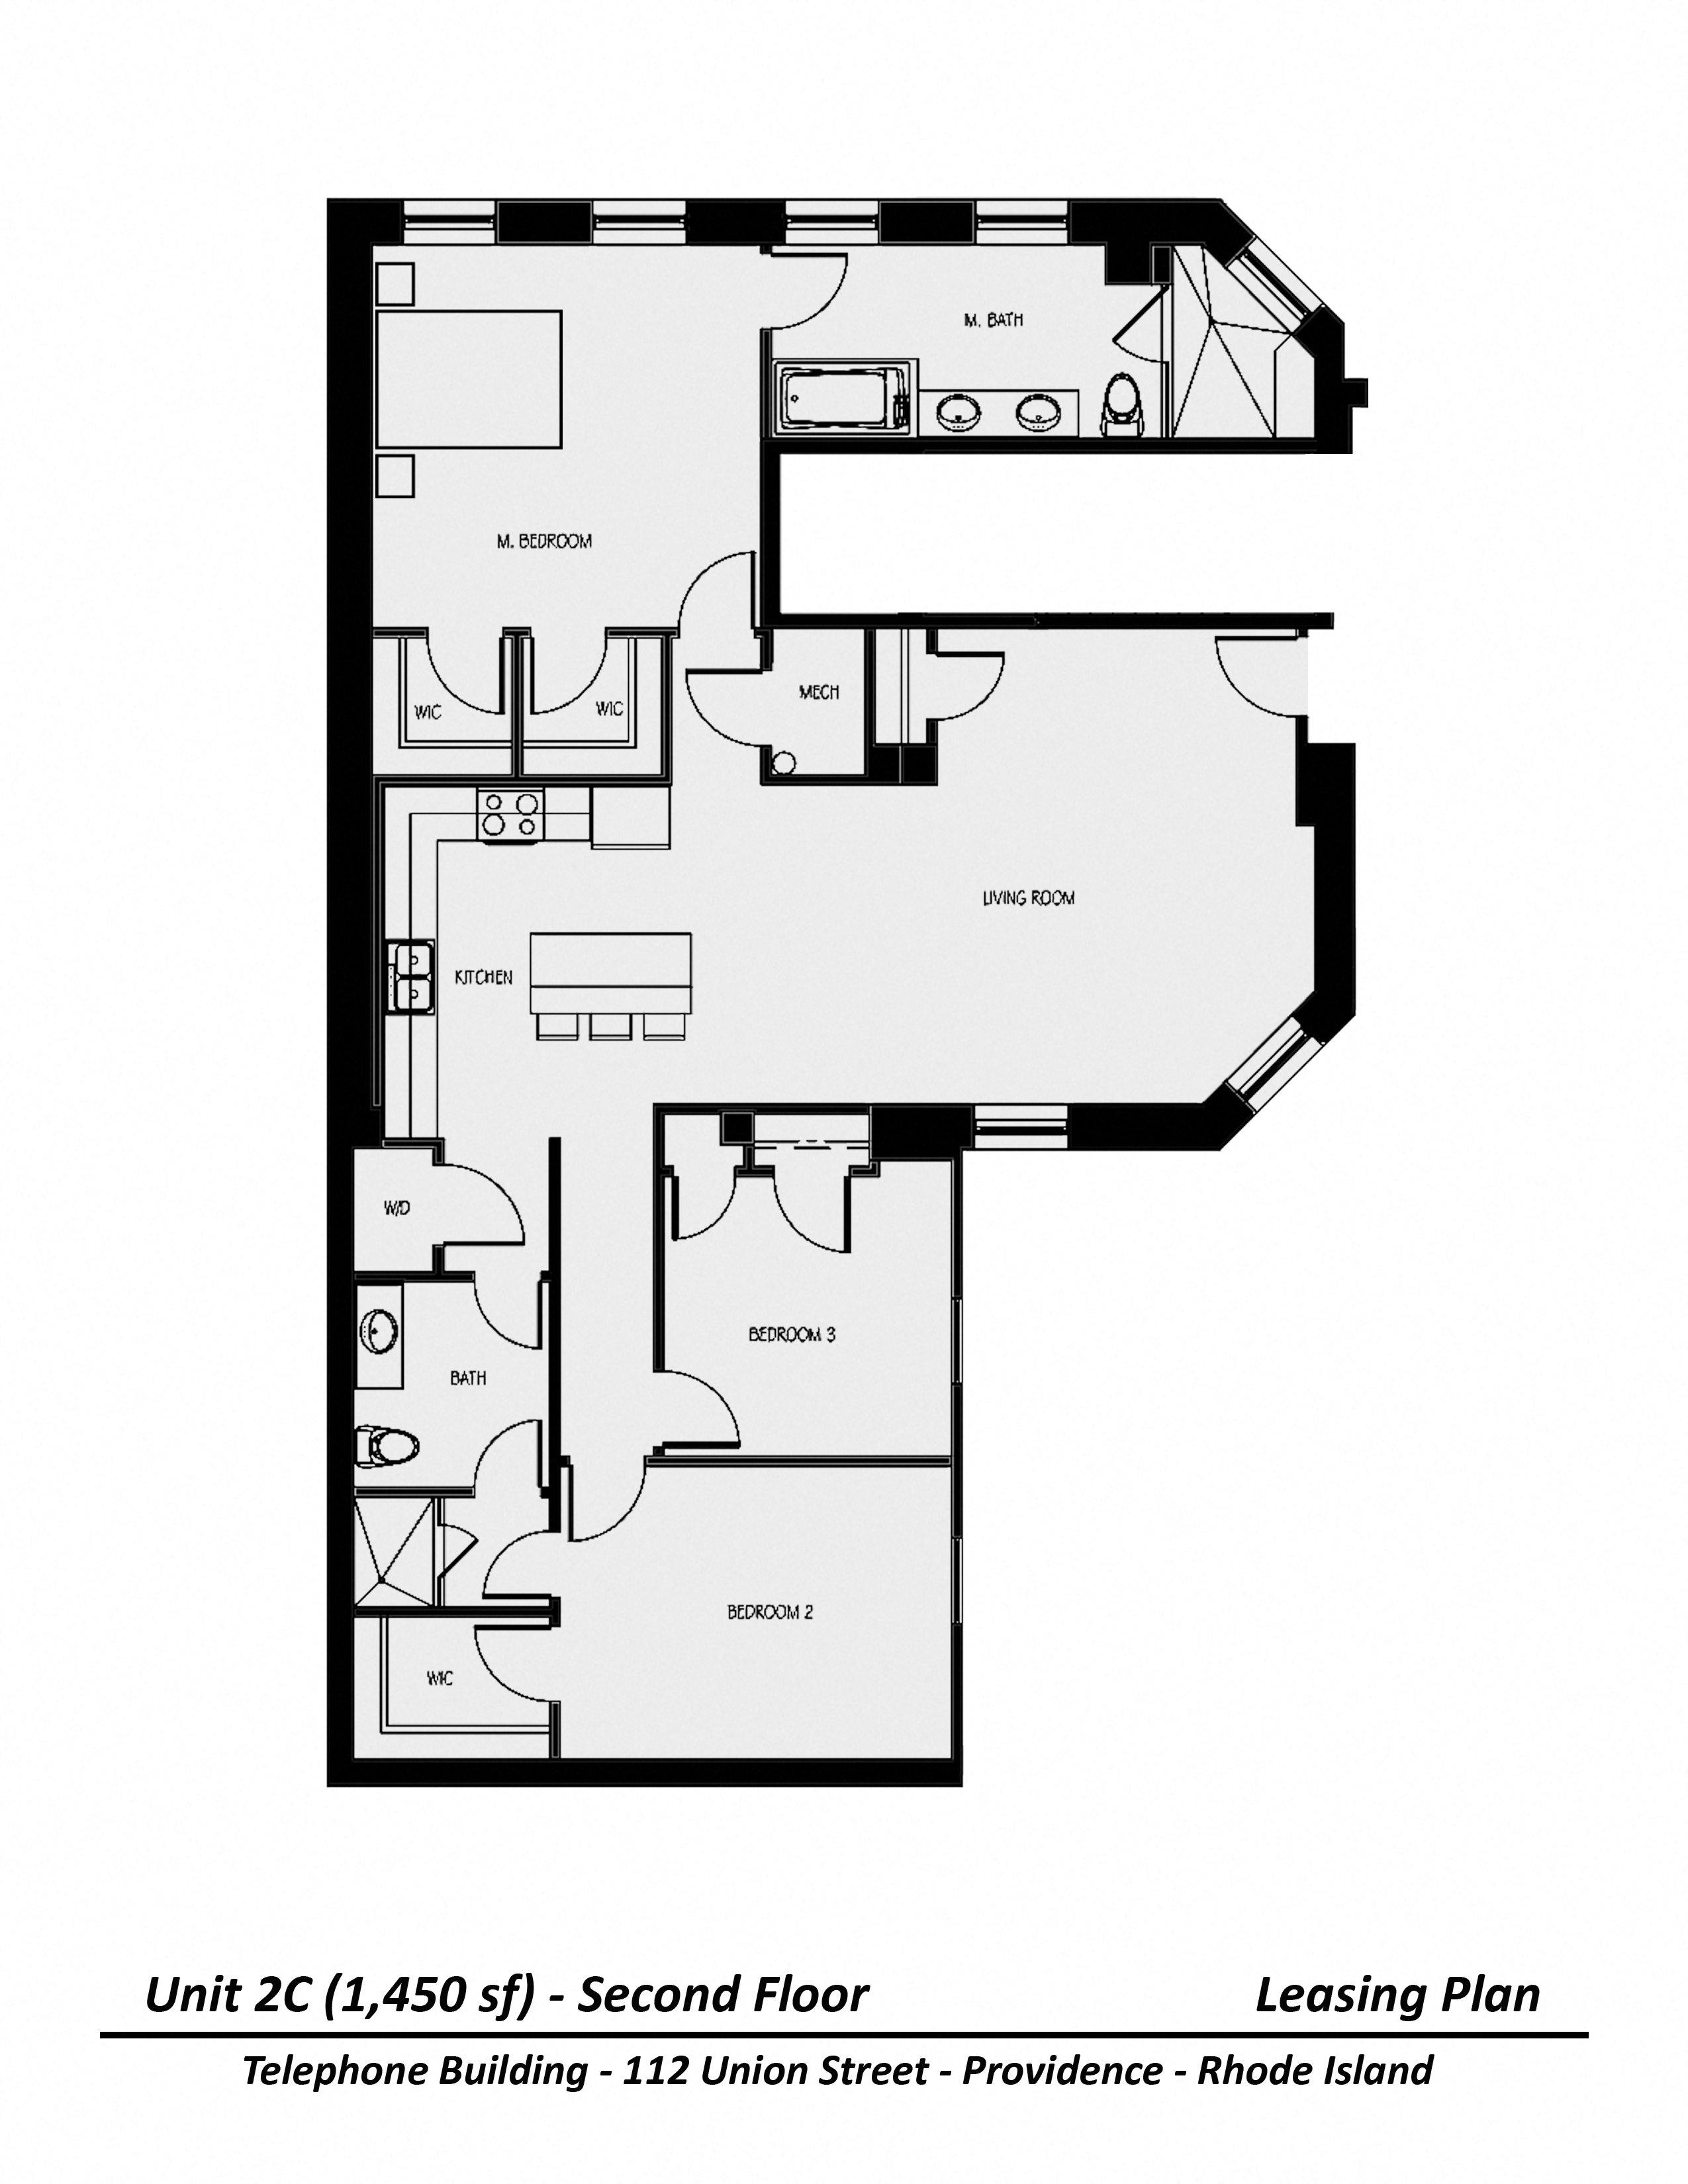 Click to view Three Bedroom floor plan gallery